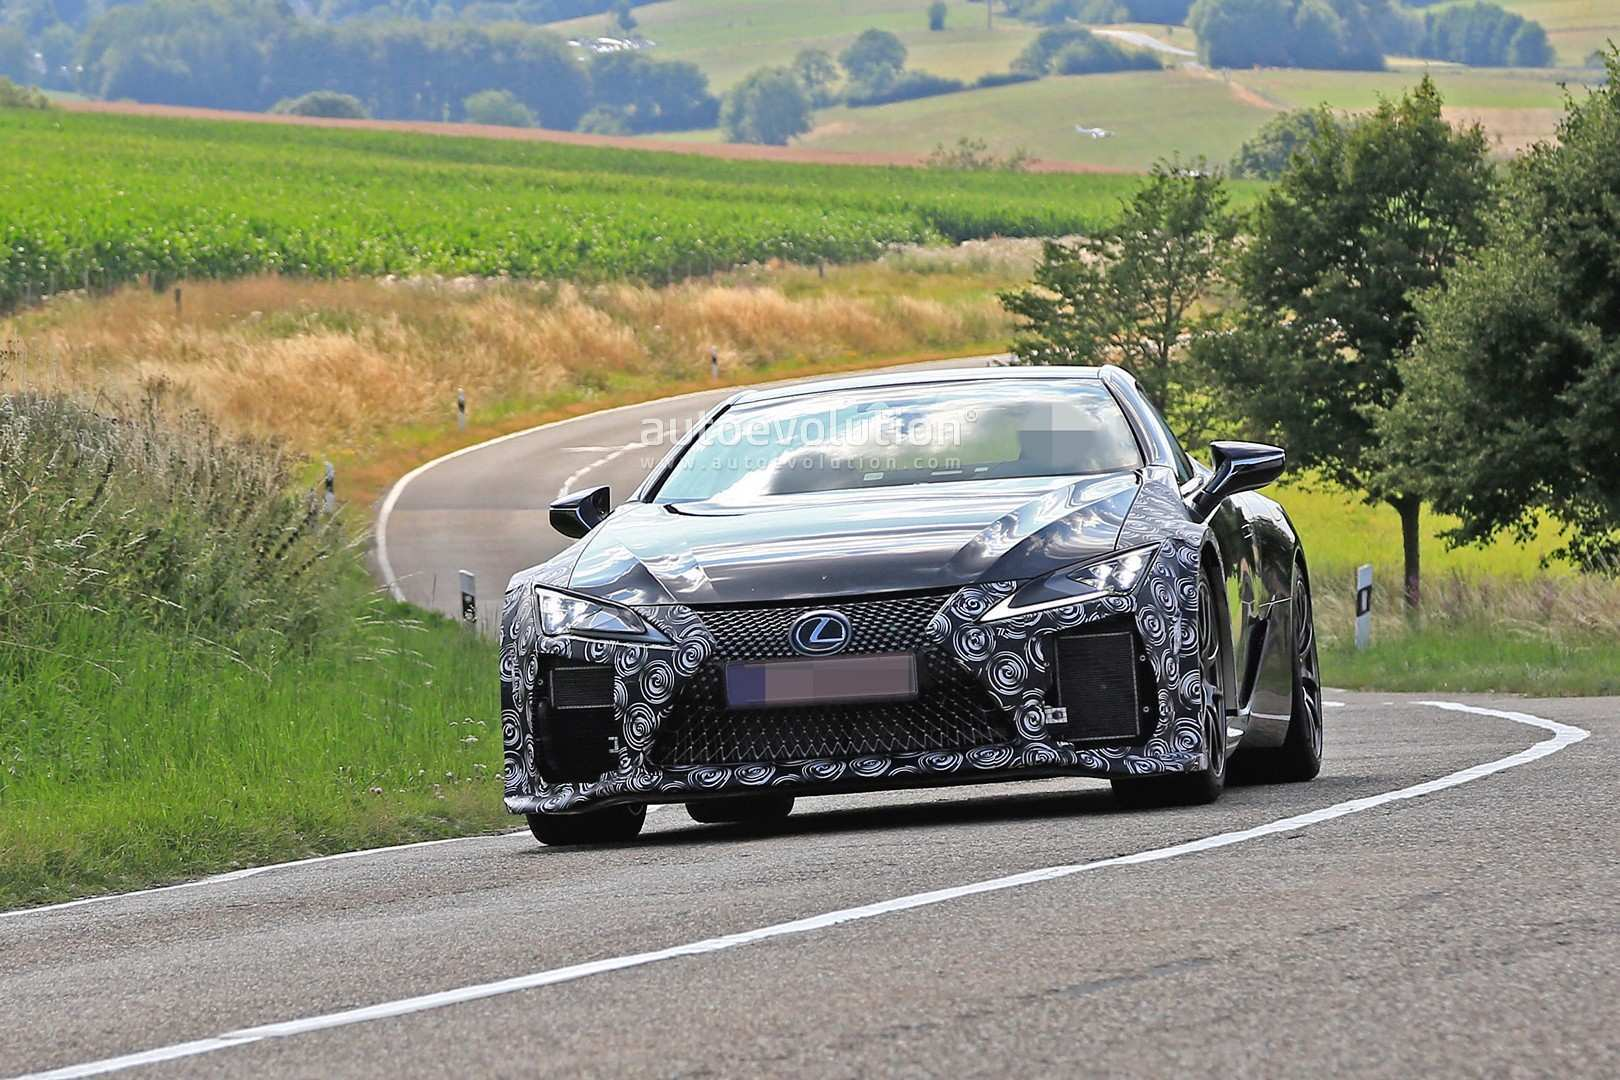 40 Best Review 2020 Lexus LF LC Spesification by 2020 Lexus LF LC